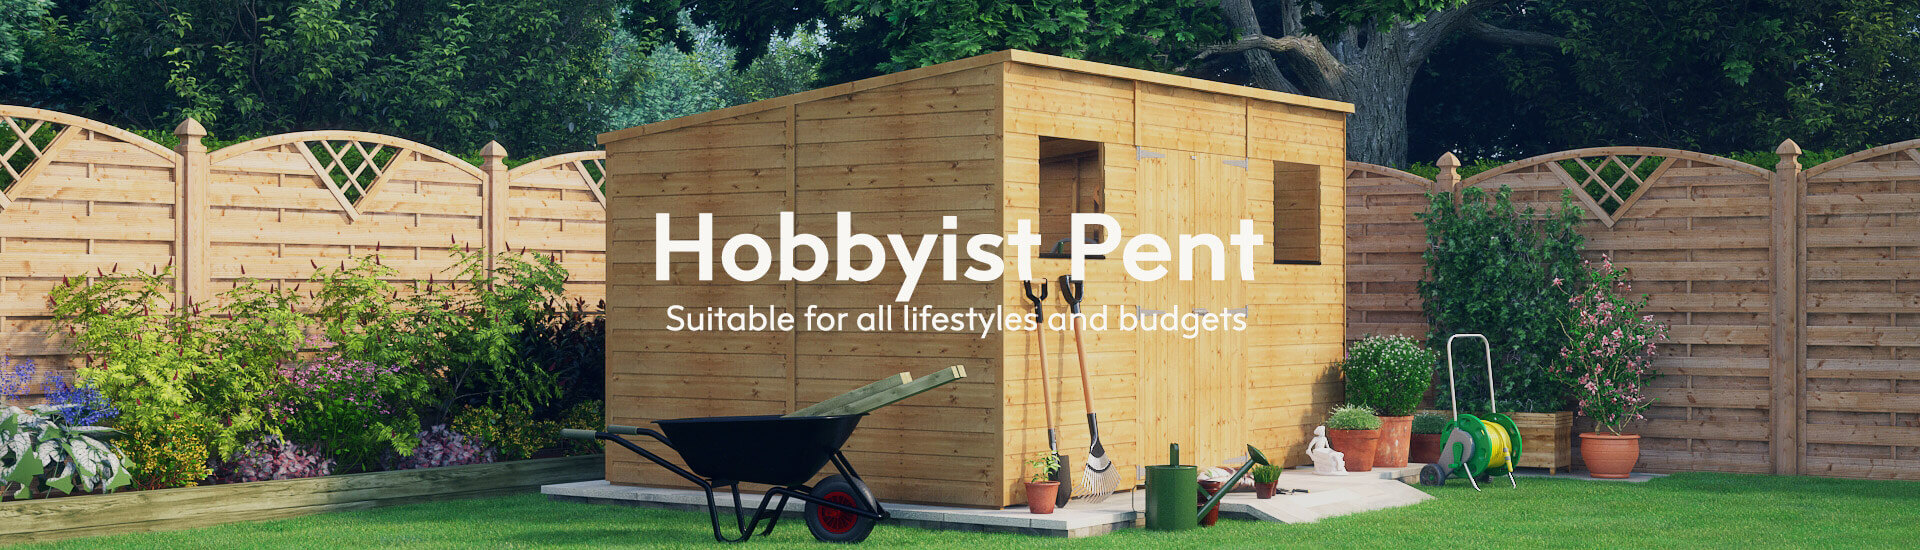 Hobbyist Pent